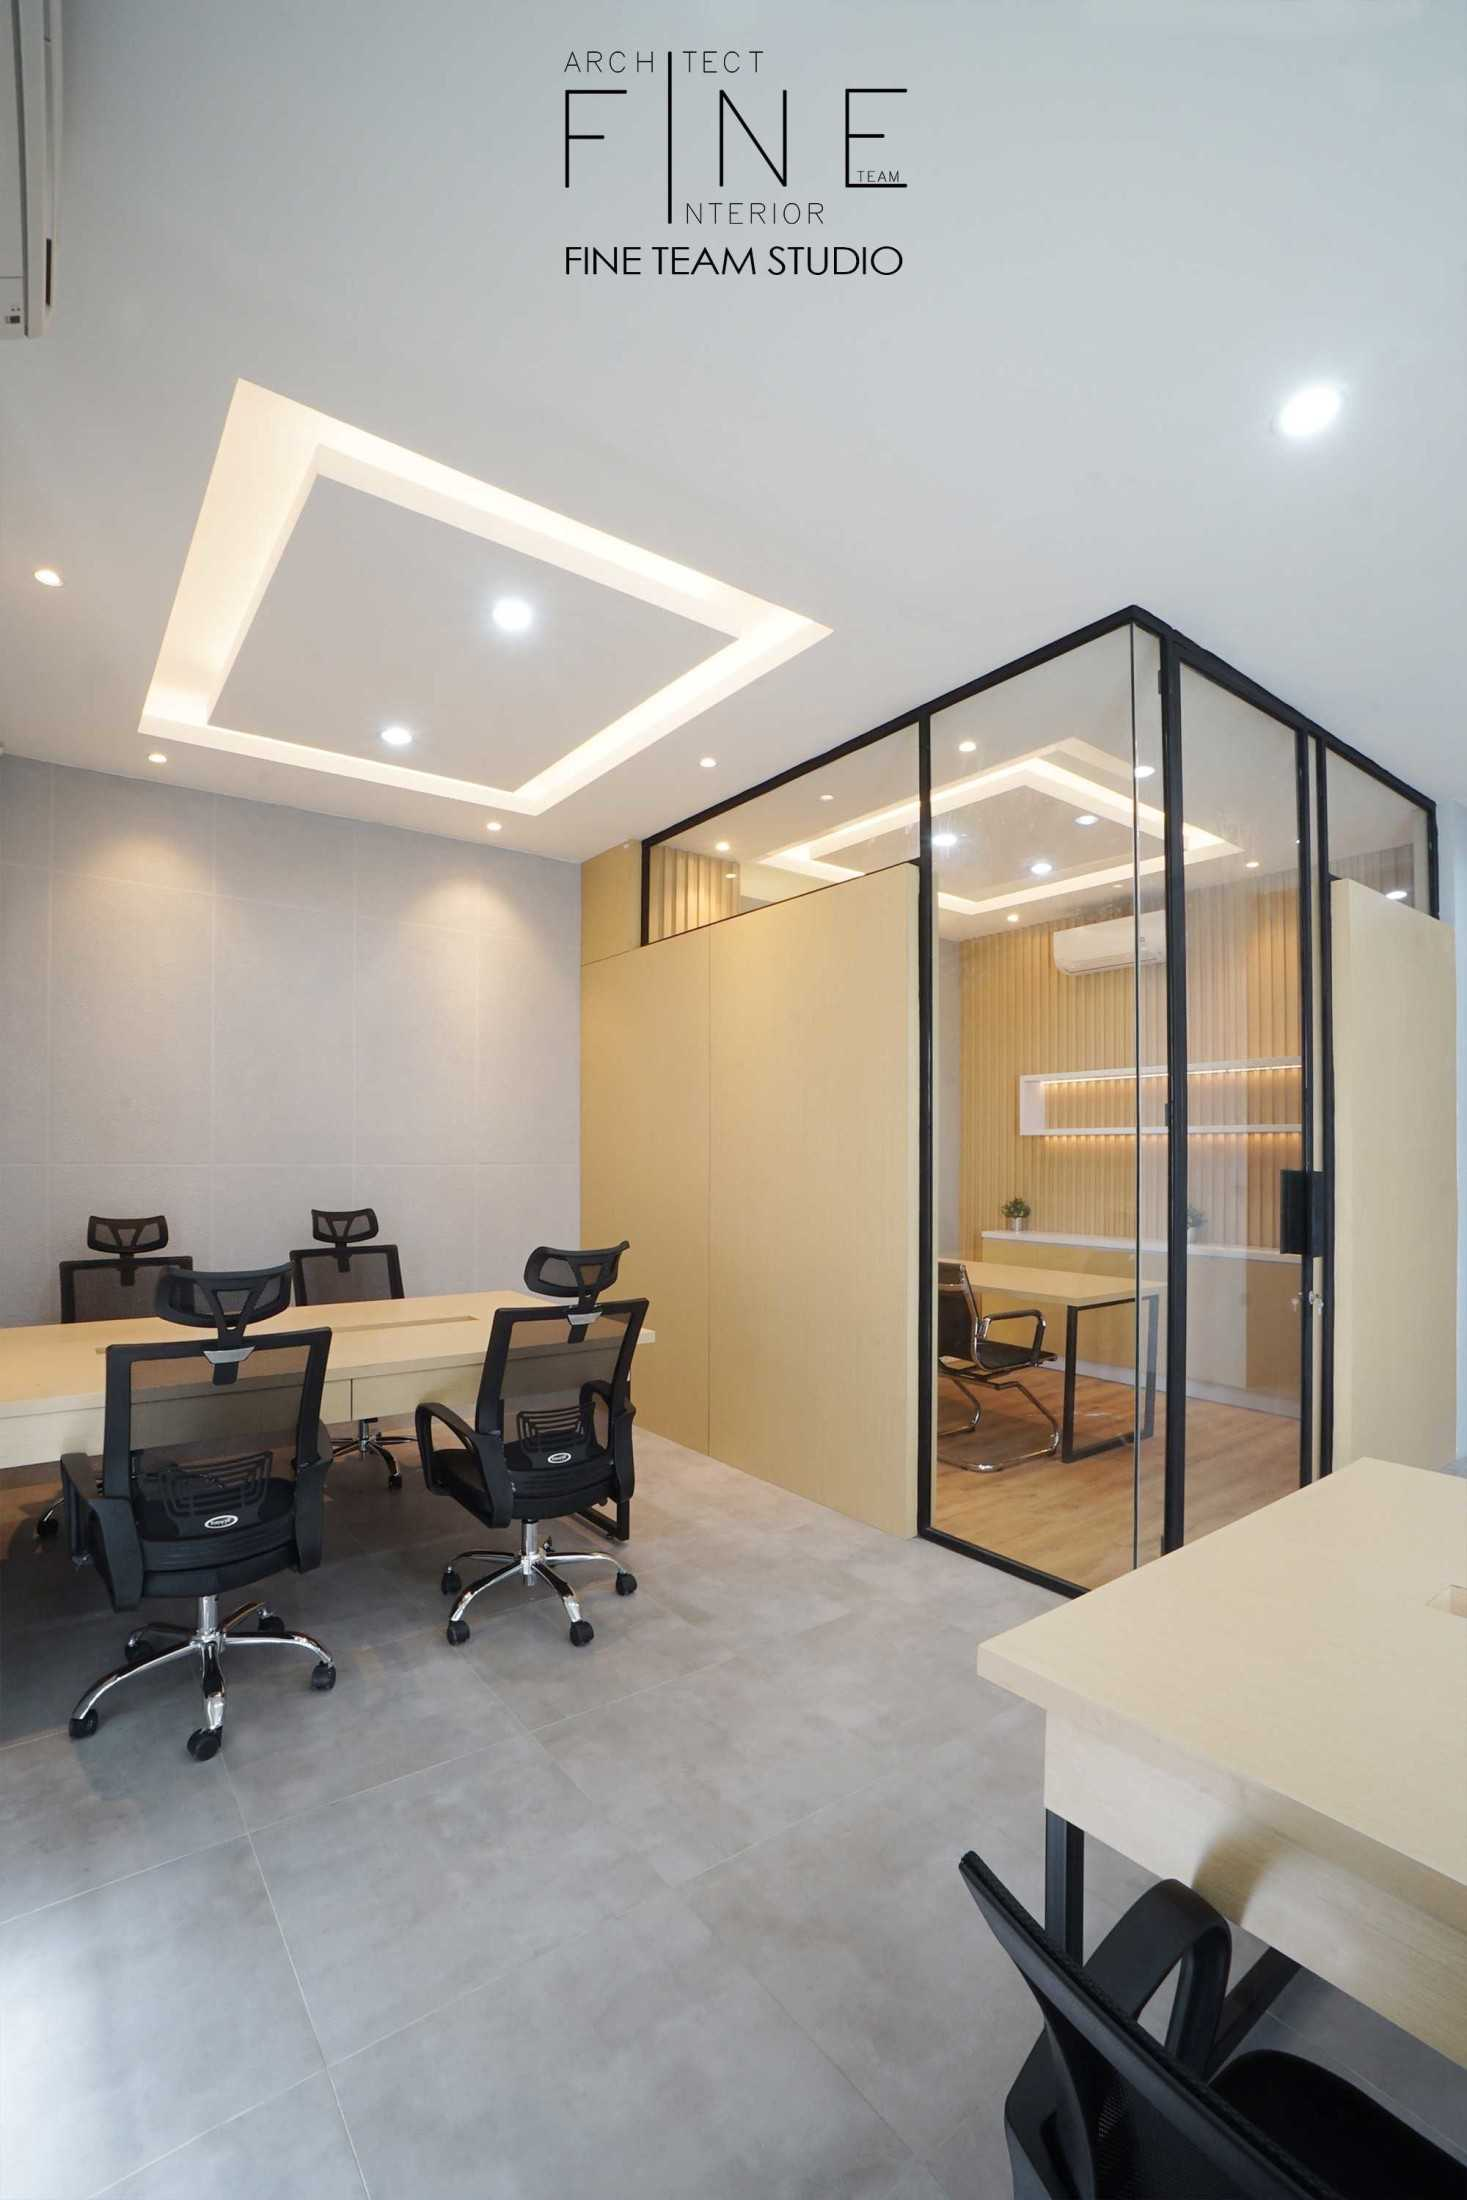 Fine Team Studio Mob Office Cikupa, Tangerang, Banten, Indonesia Cikupa, Tangerang, Banten, Indonesia Fine-Team-Studio-Mob-Office  71121